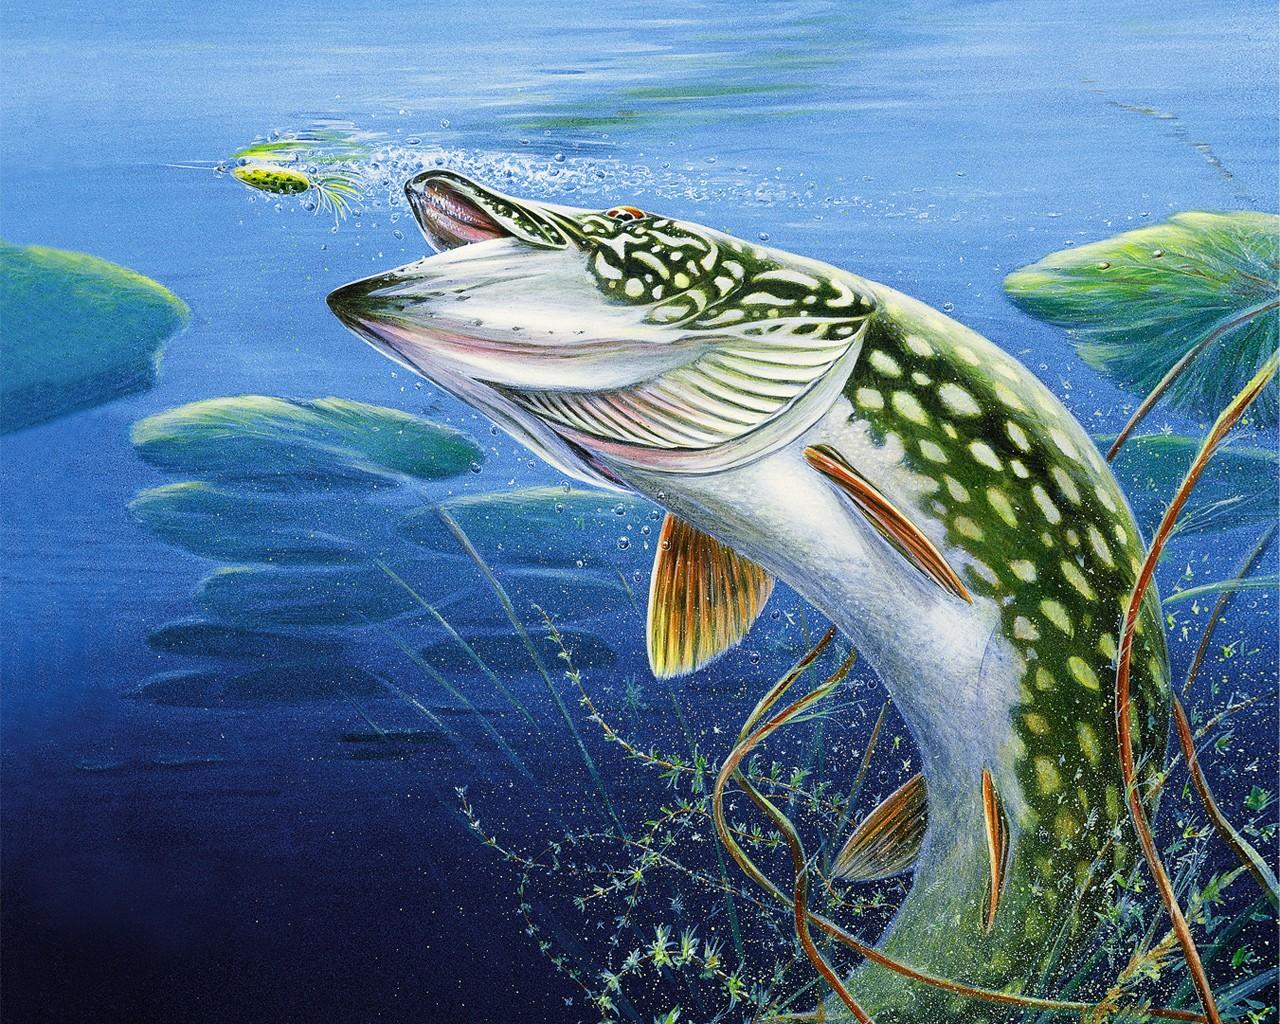 Fishing Wallpaper 1280x1024 Fishing 1280x1024